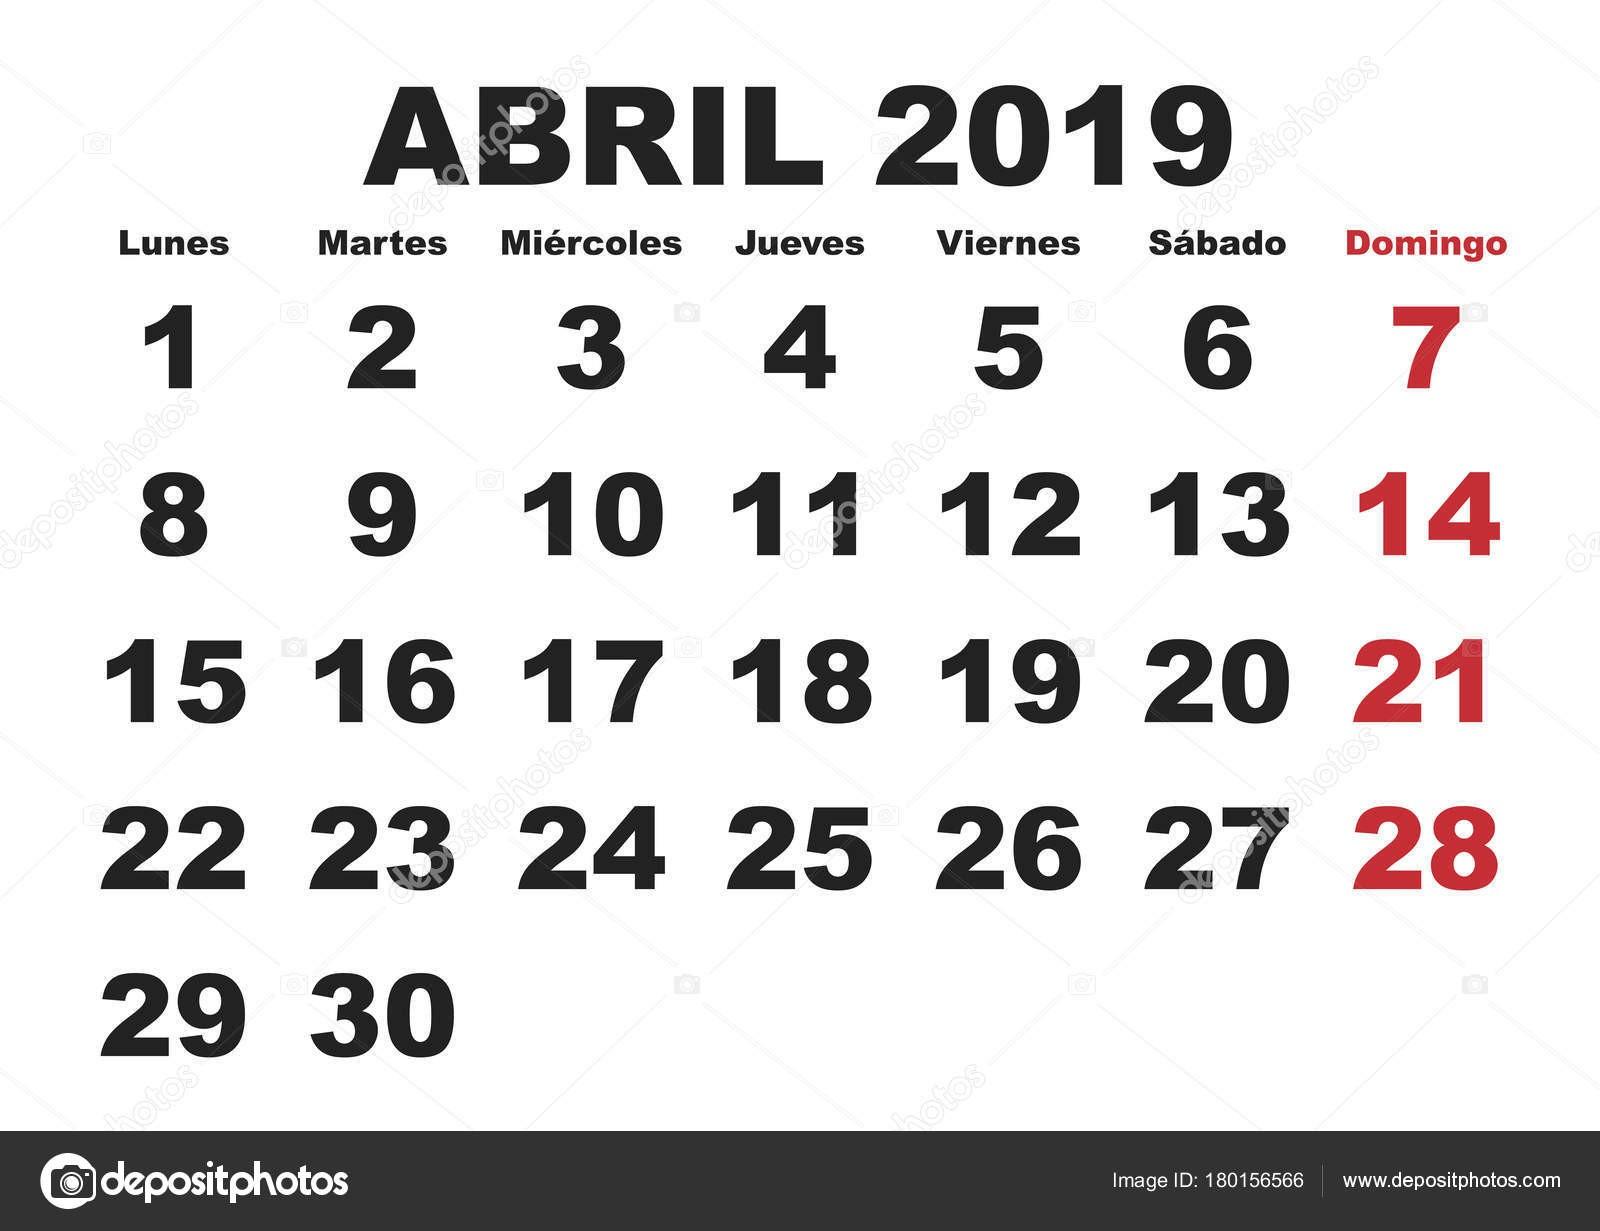 depositphotos stock illustration abril 2019 wall calendar spanish